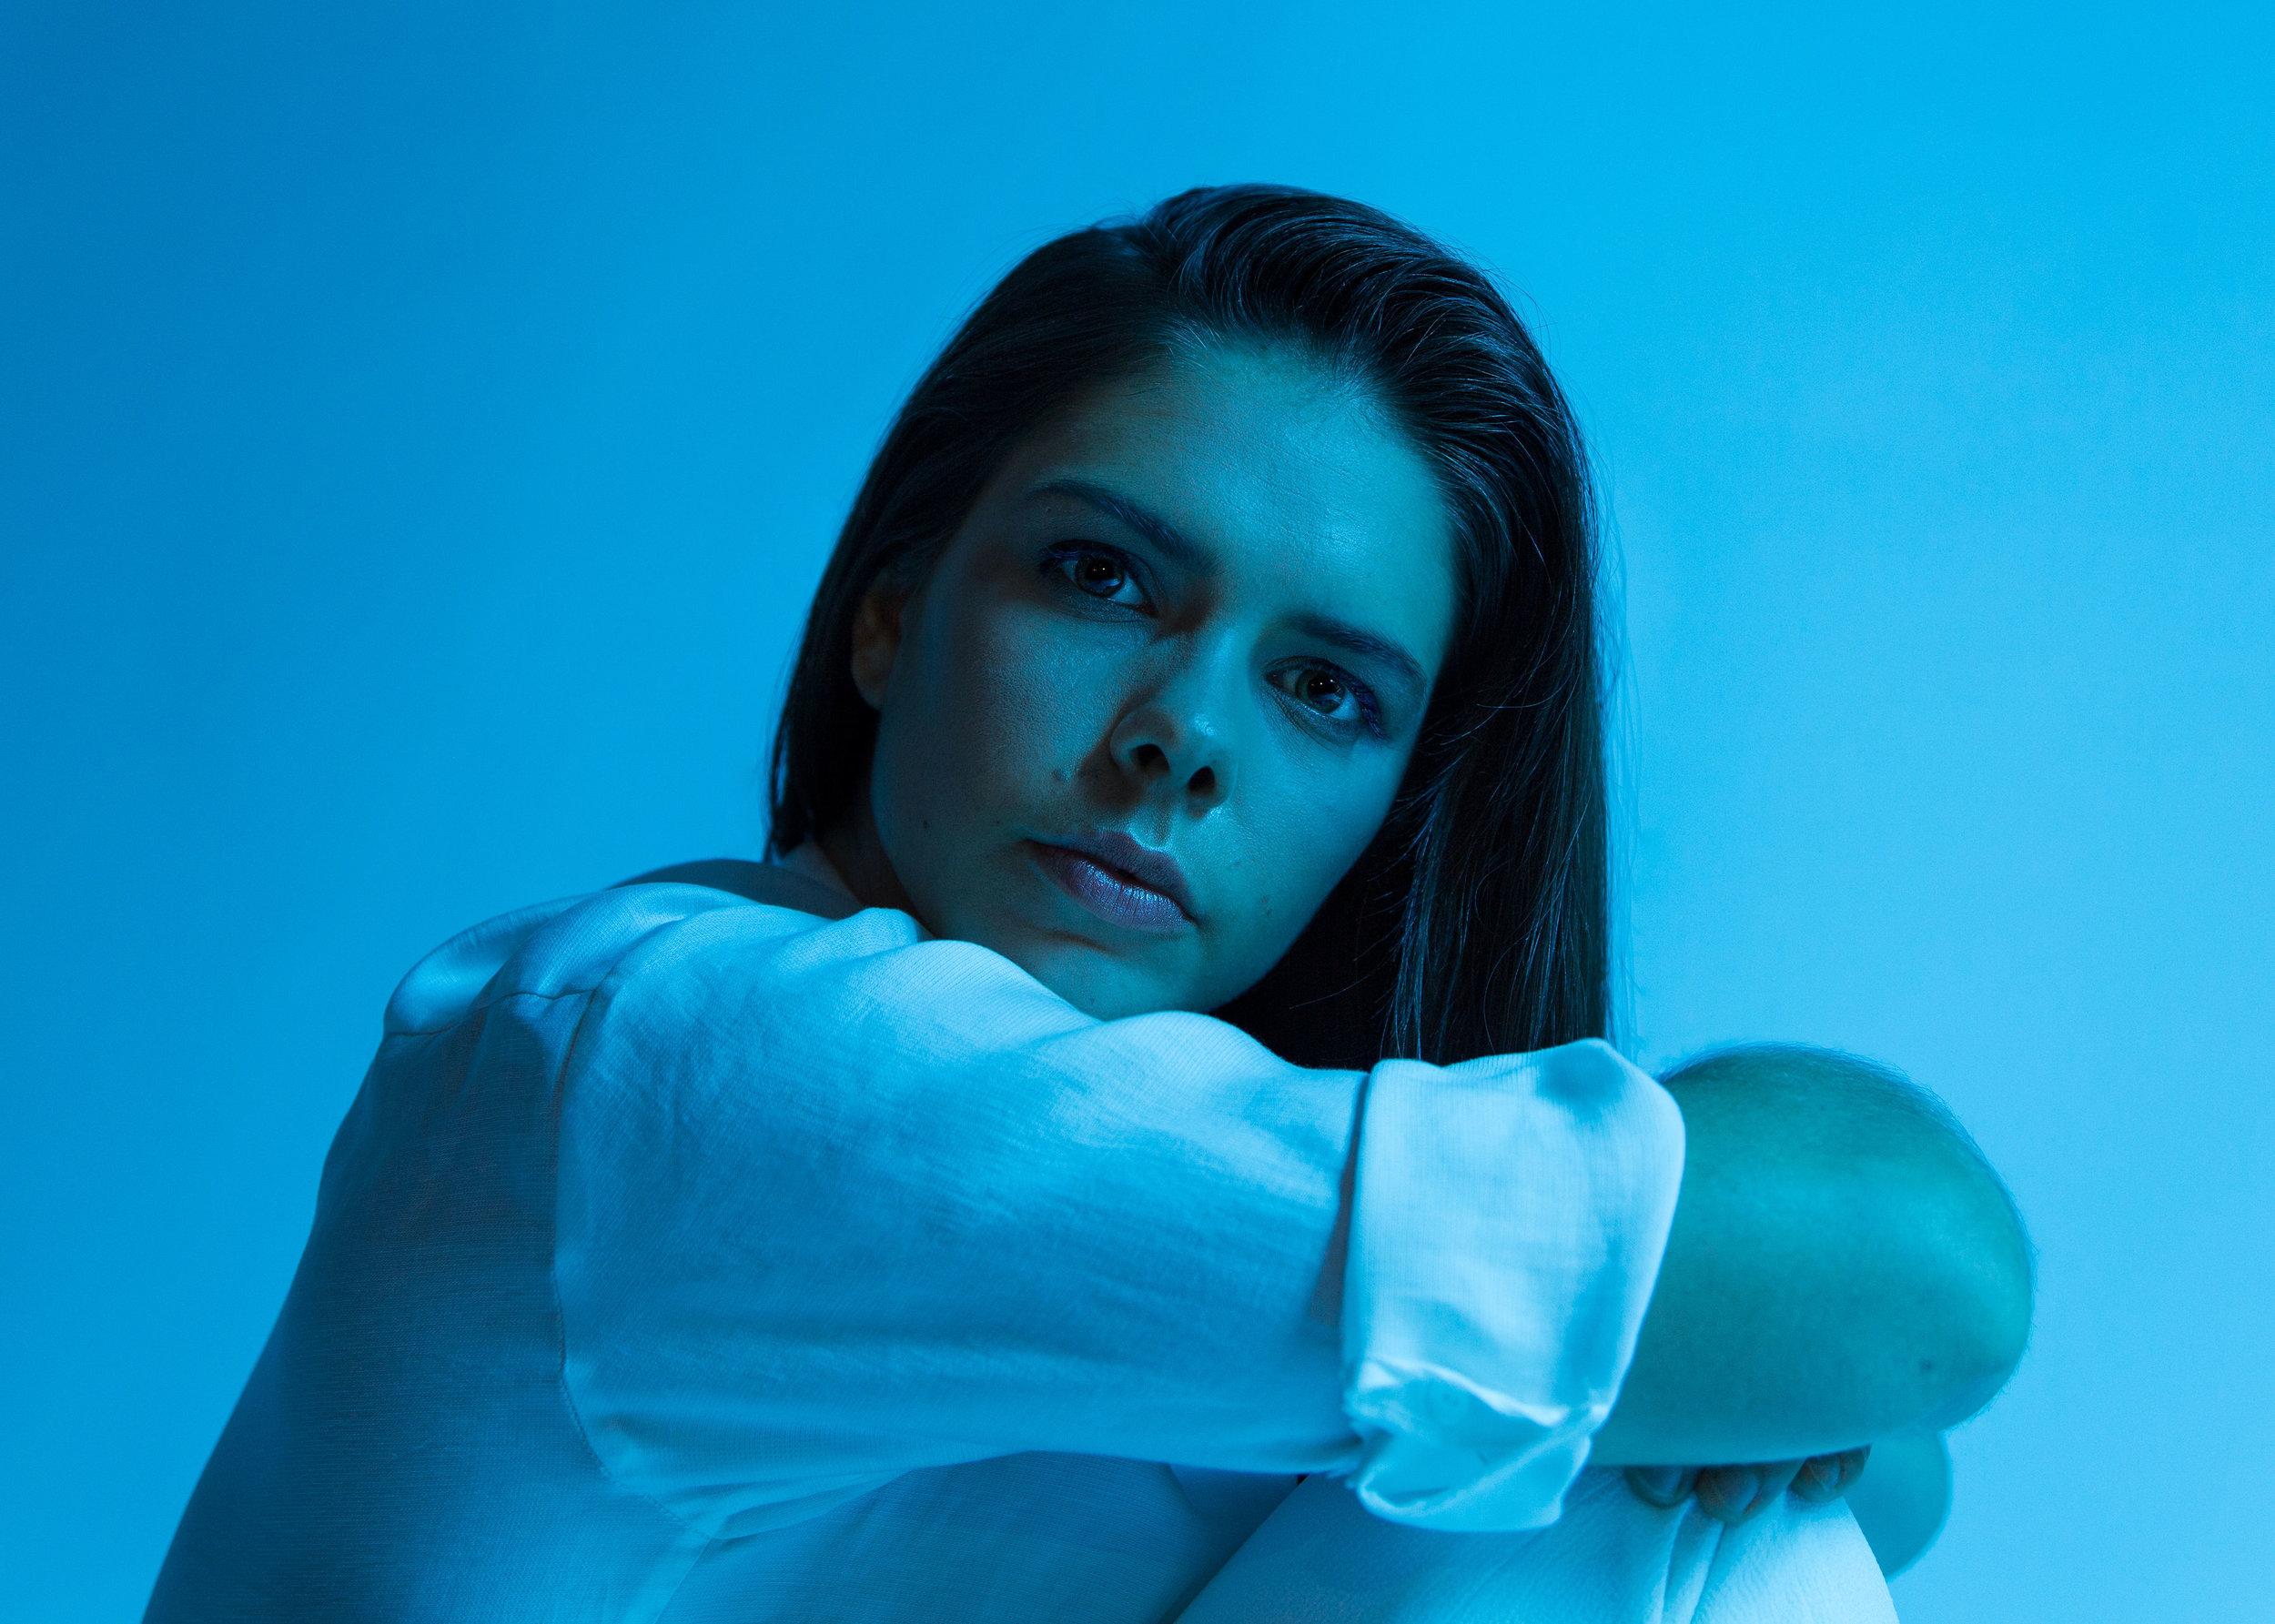 LeanneHoffman_CarolinaAndrade2.jpg